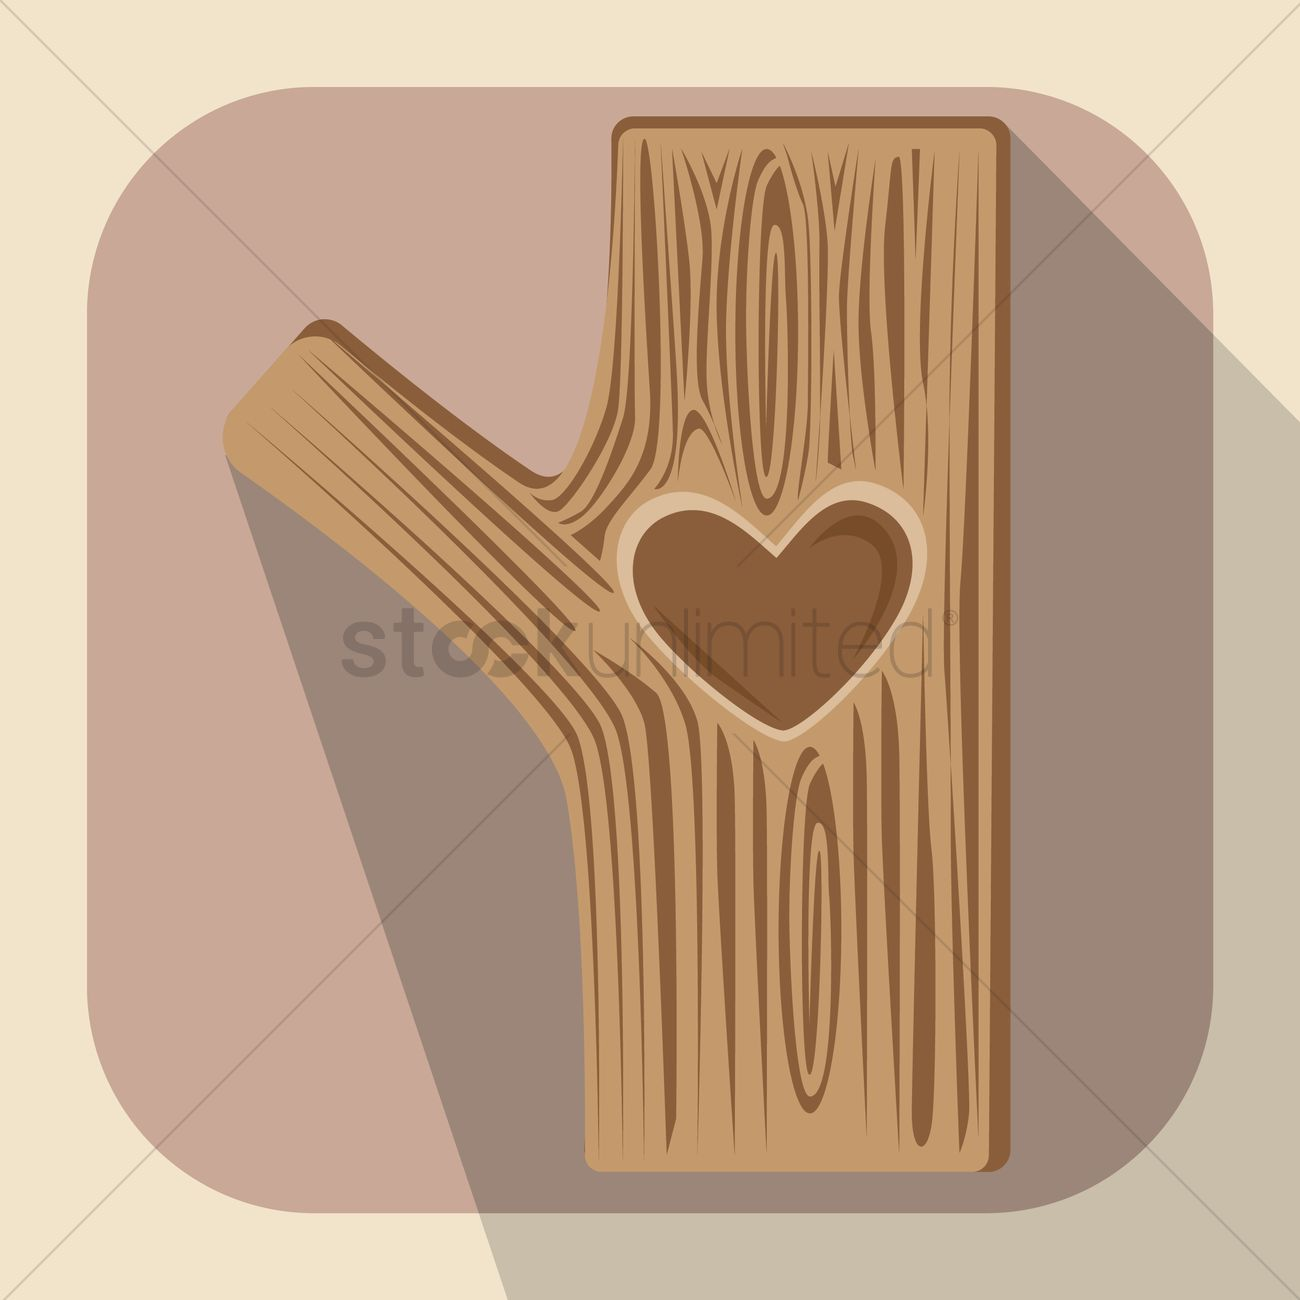 1300x1300 Engraved Heart Shape On Tree Bark Vector Image